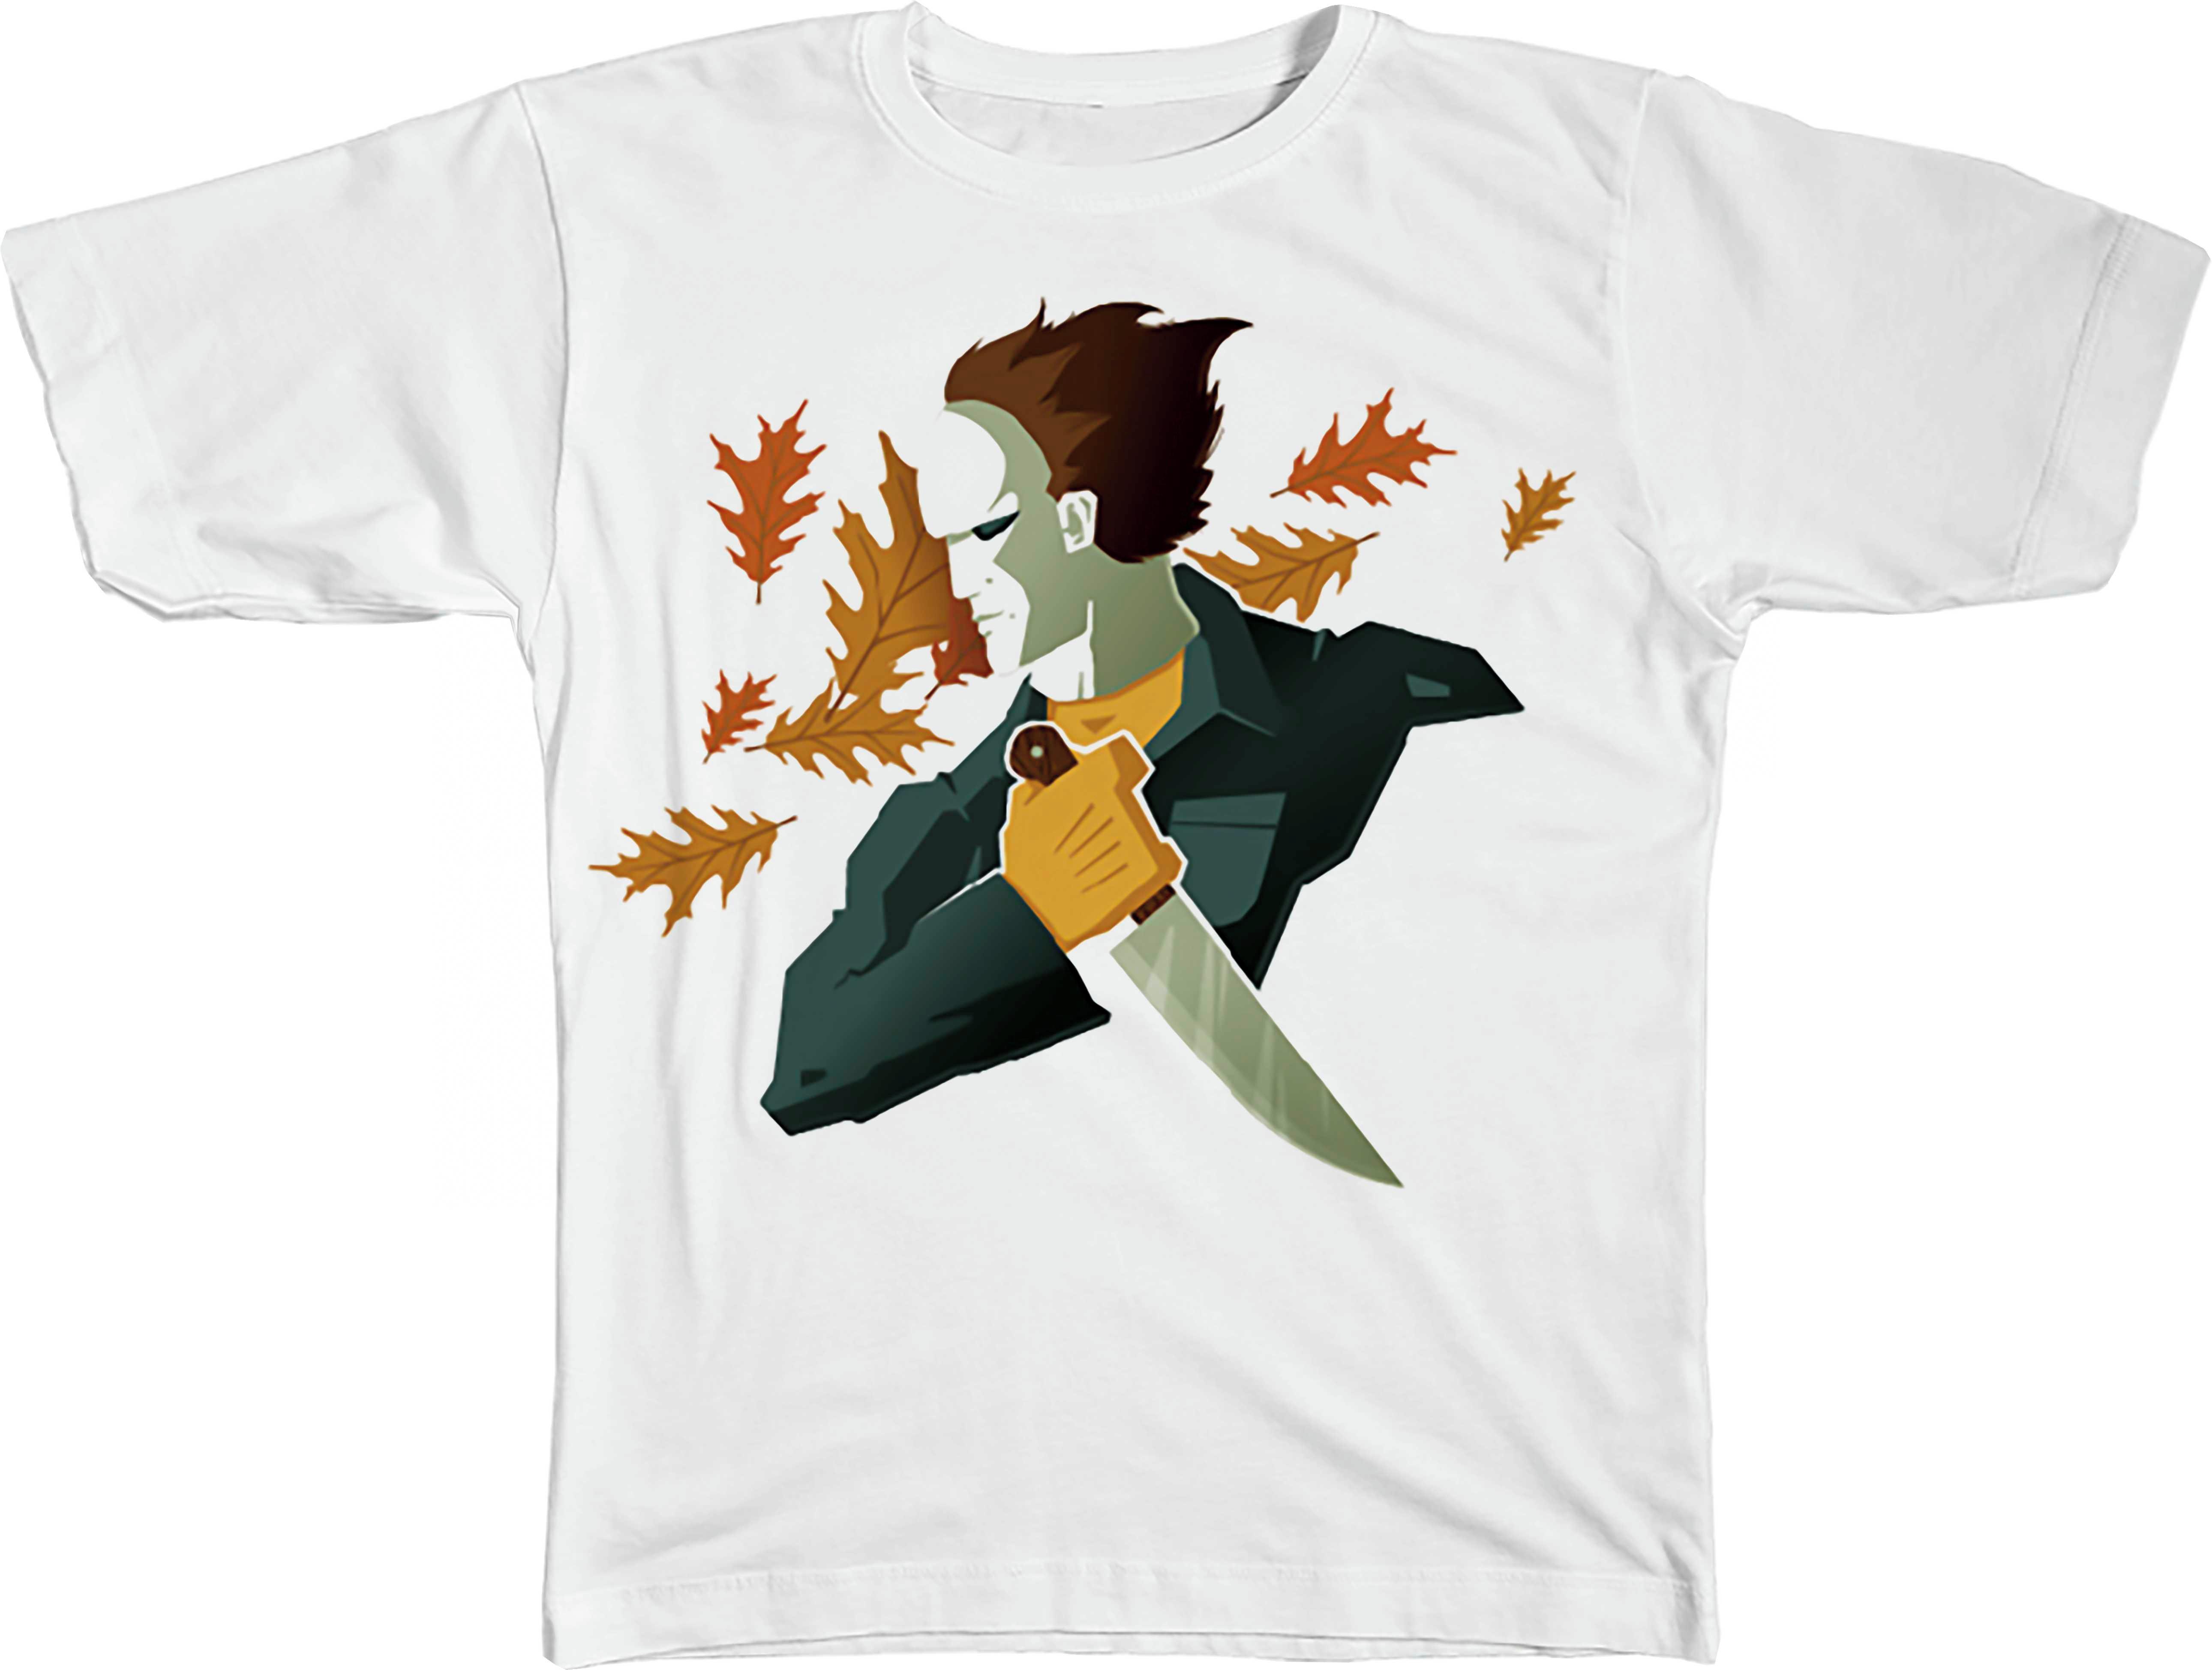 7ebd058a2 Camisa Camiseta Blusa Personalizada Filme Desenho Pokemon 1